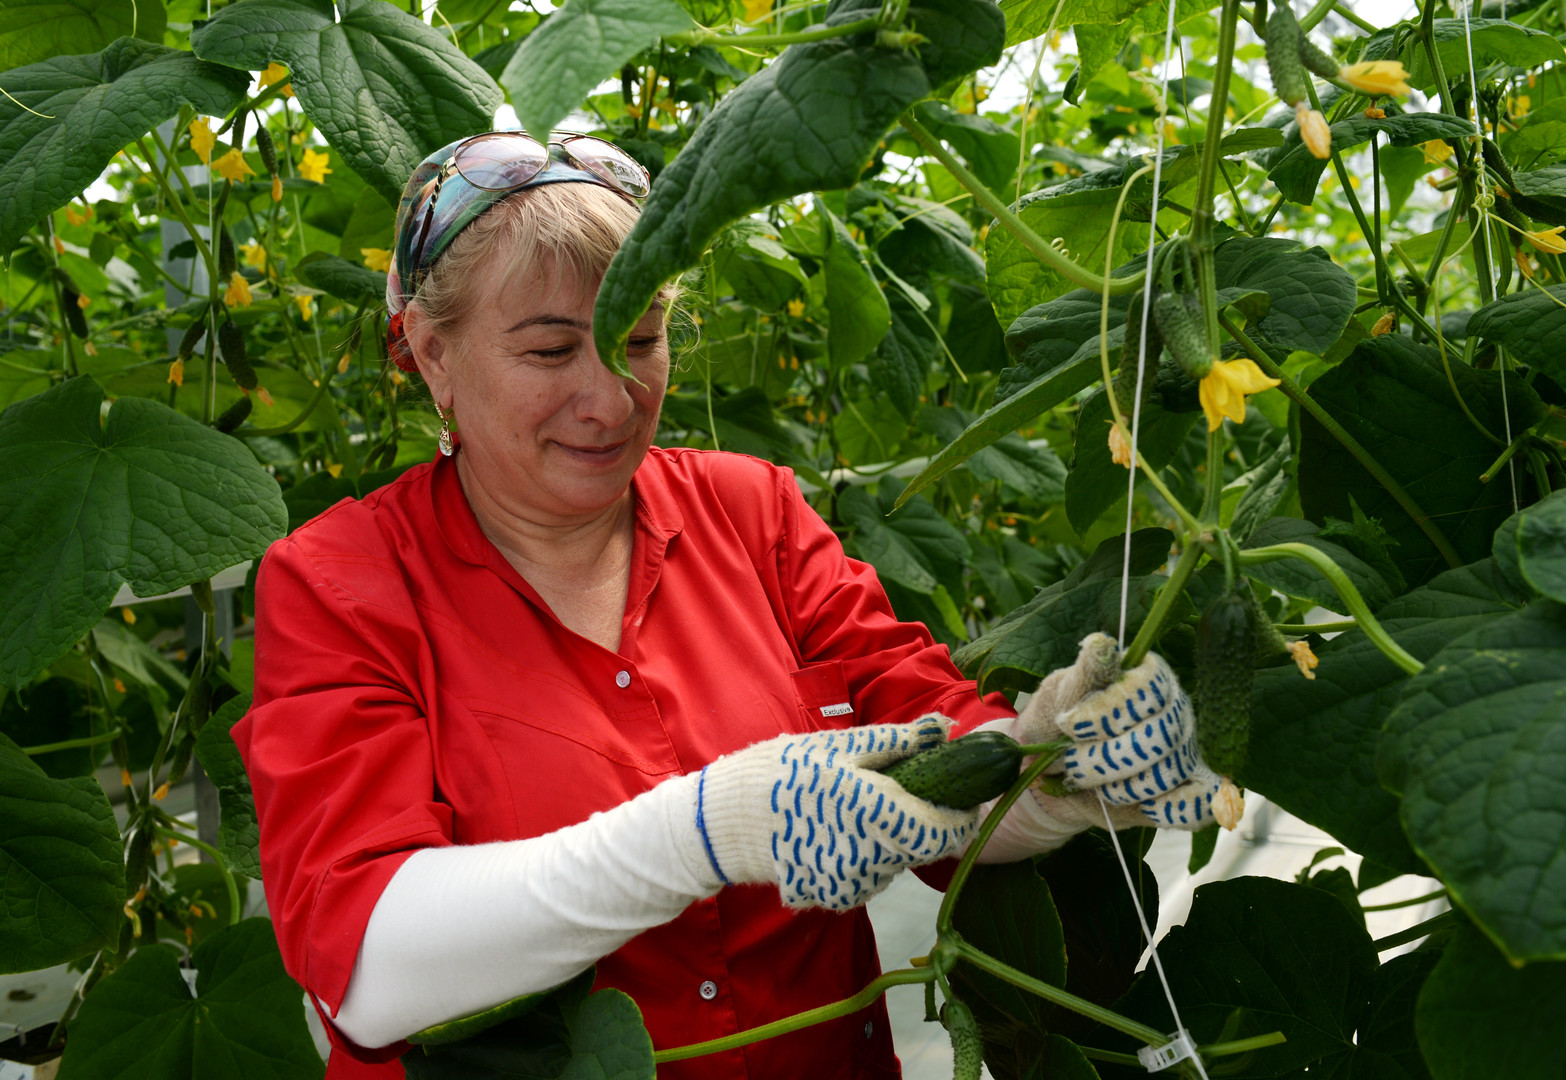 Russland verlängert Lebensmittelembargo bis Ende 2017 als Gegenmaßnahme zu EU-Sanktionen